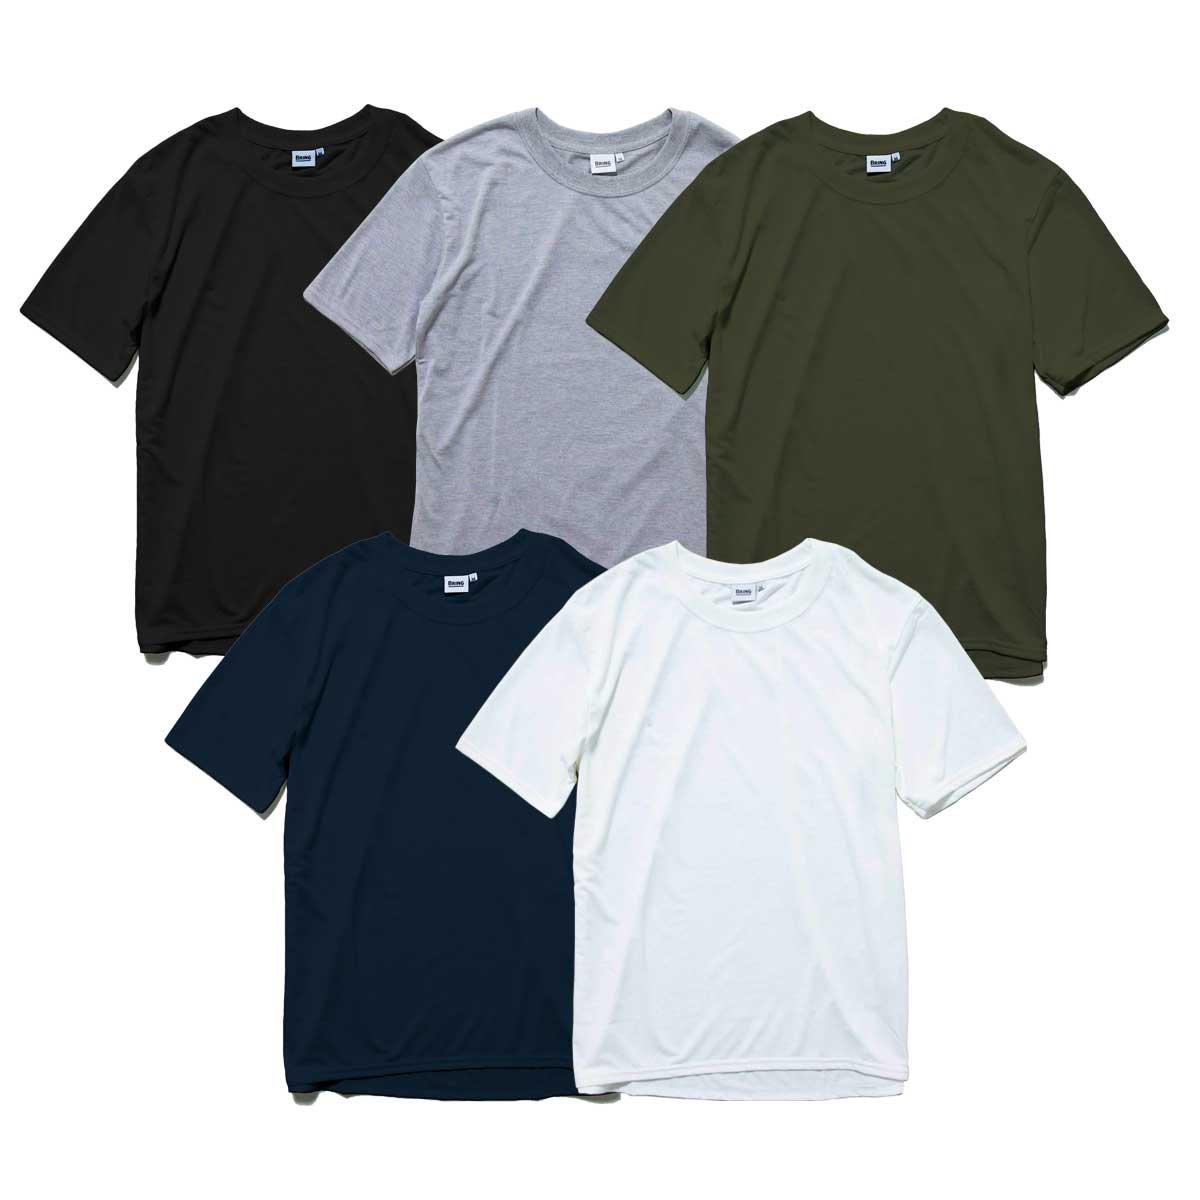 BRING T-SHIRT BASIC DRY Tシャツ